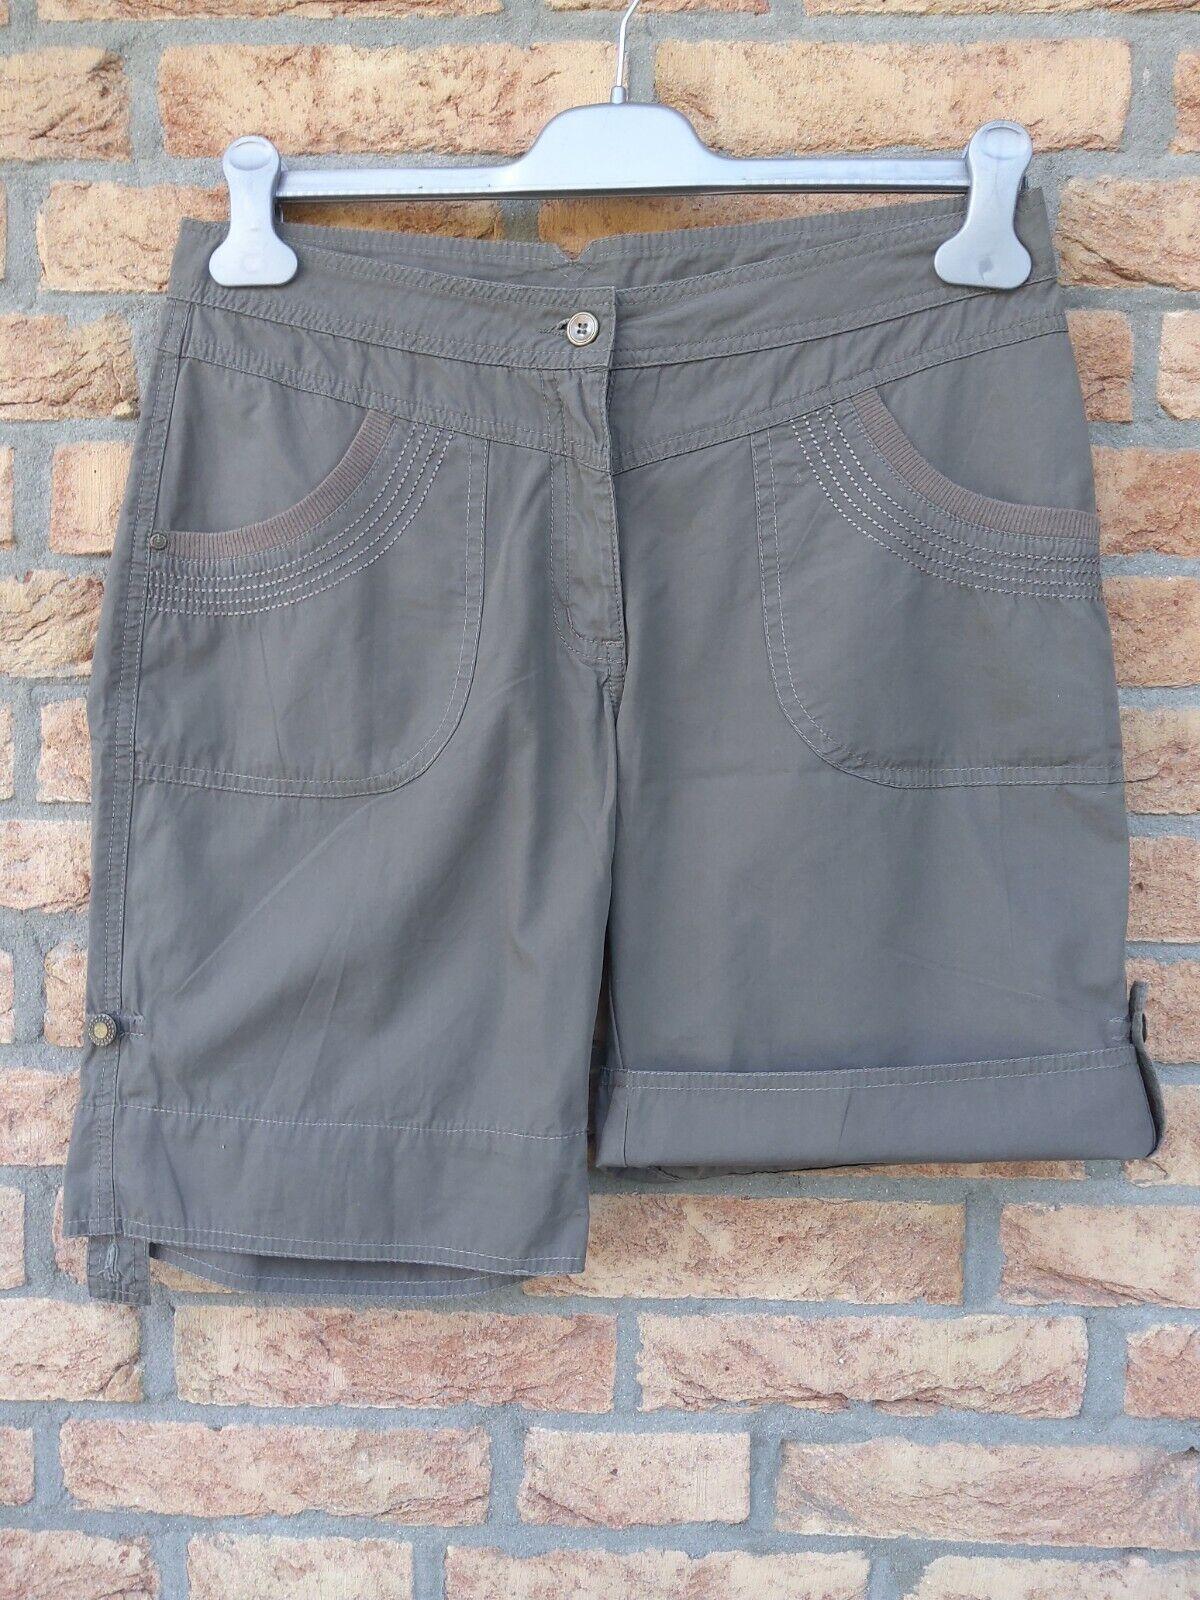 TCM by Tchibo Damen Schorts Gr. 38 Shorts Bermuda Khaki Cotton Sehr gut